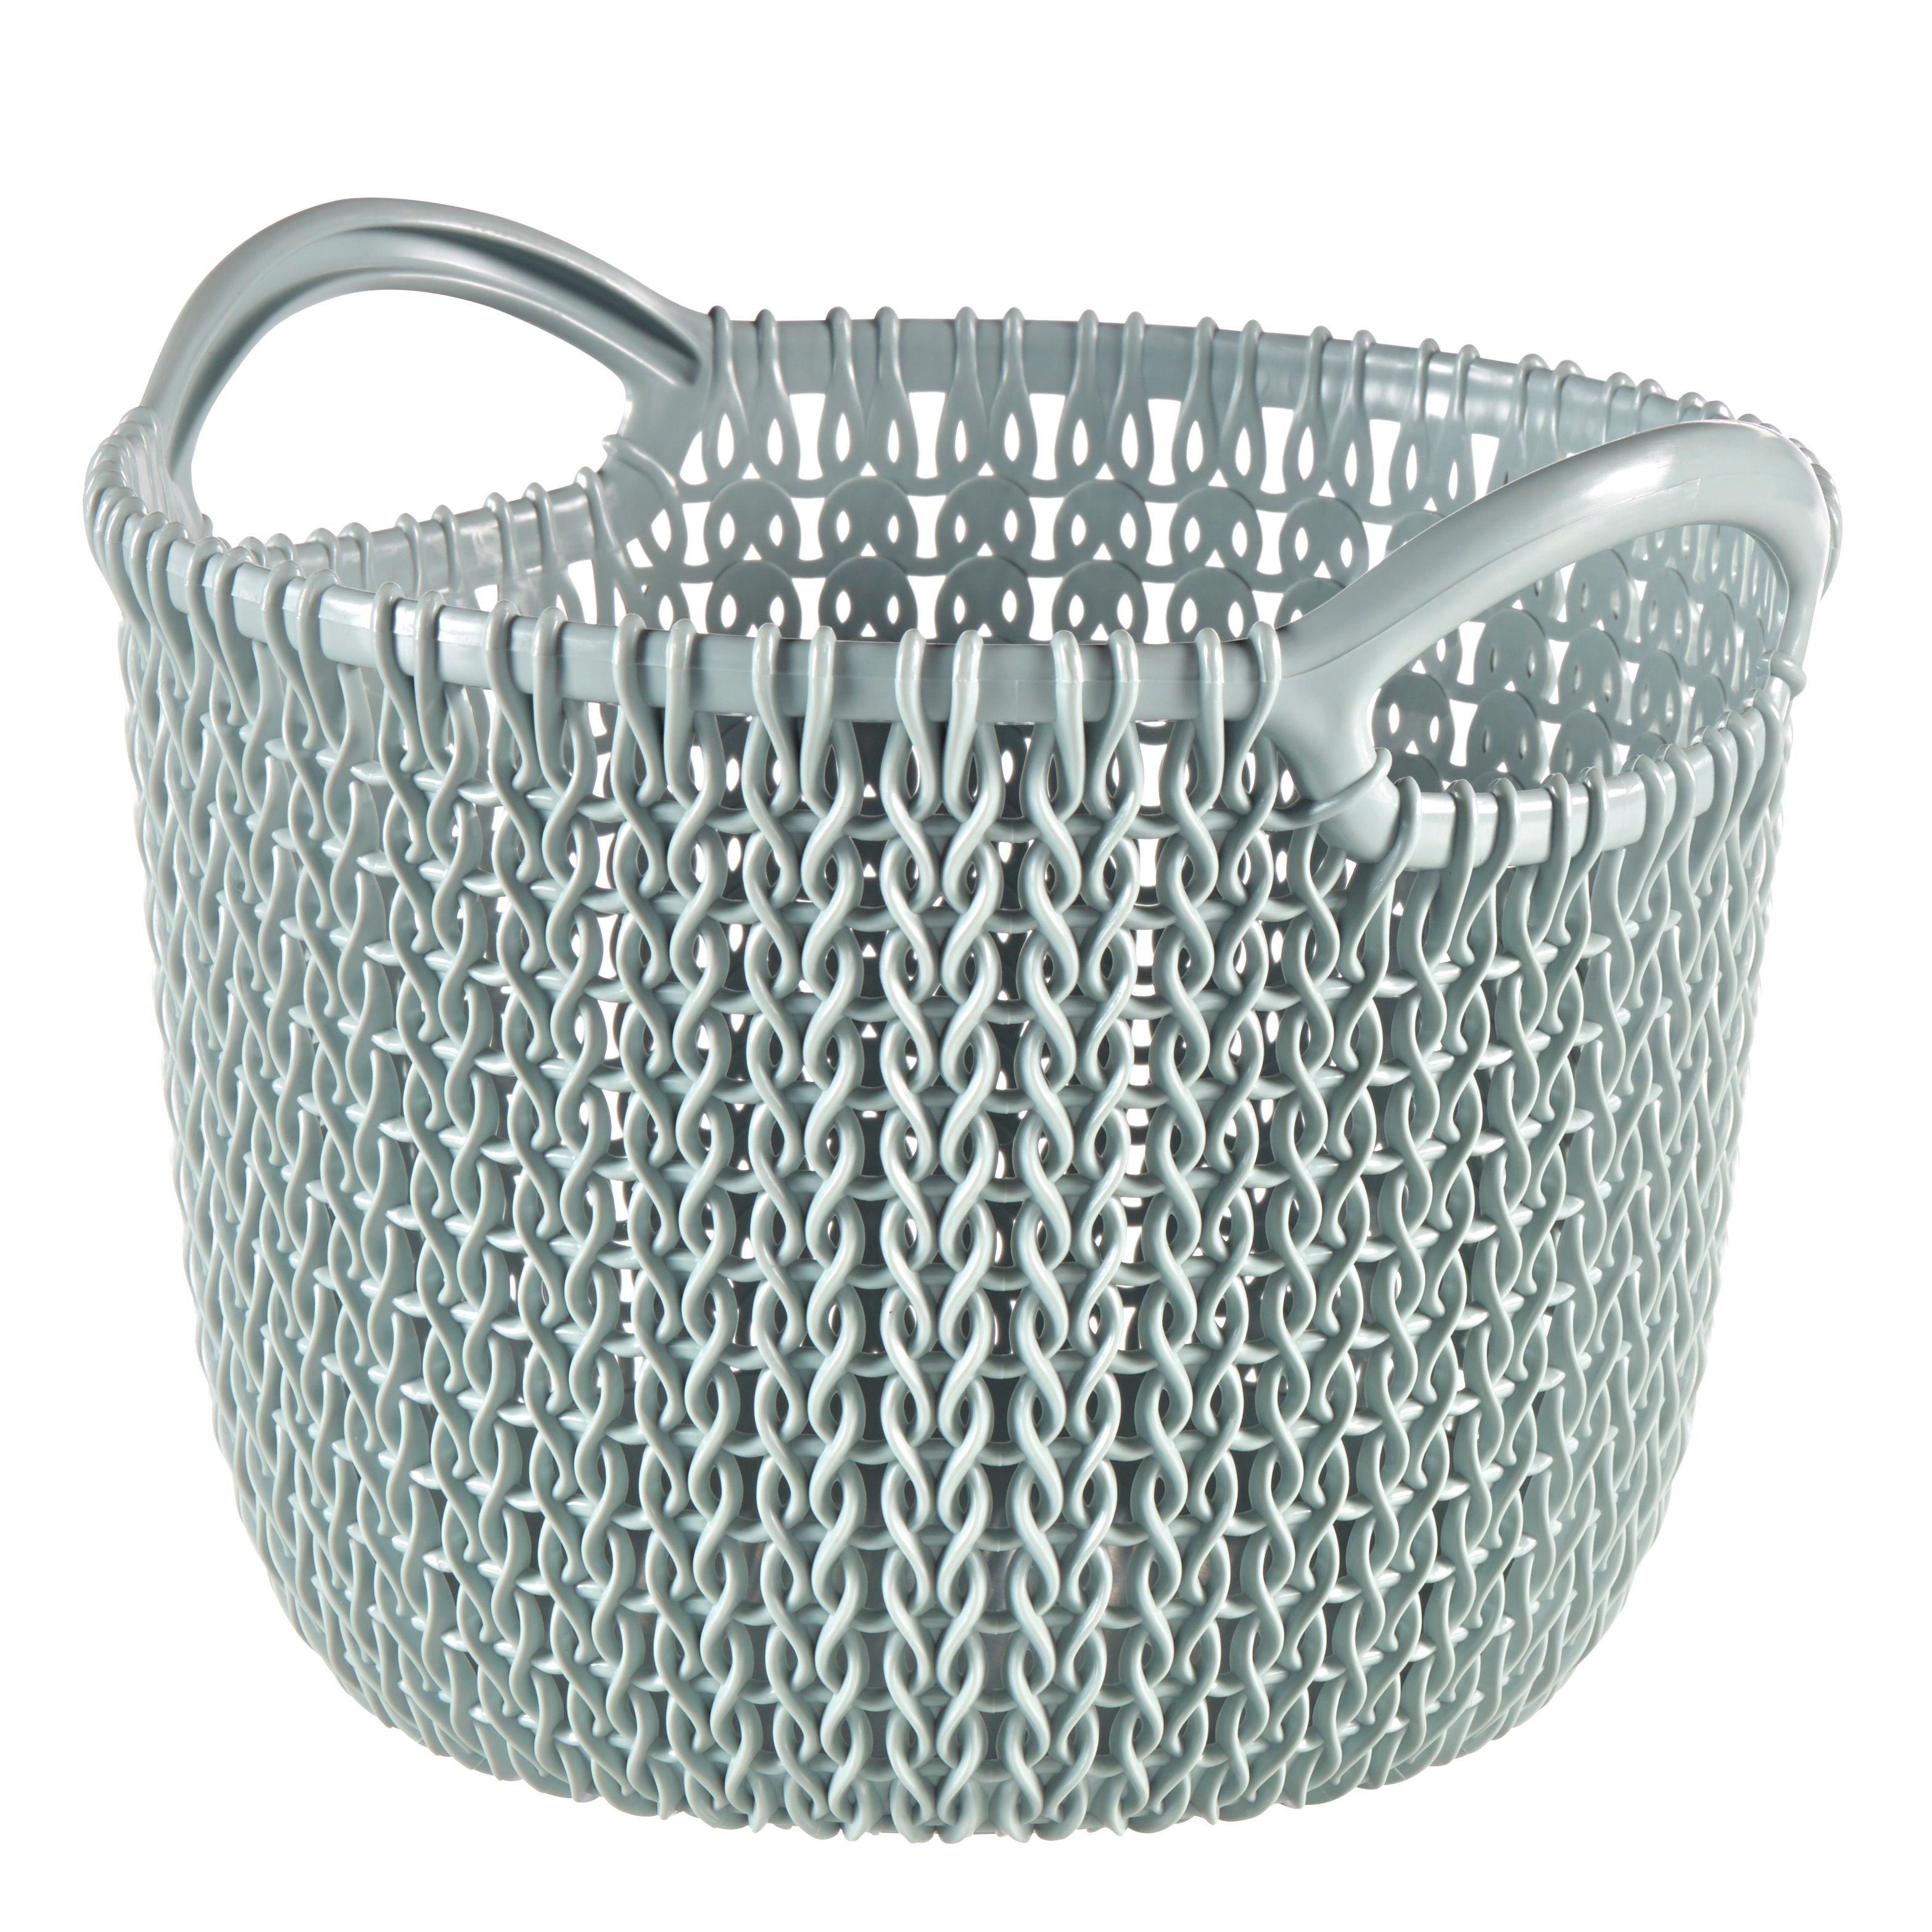 Curver Knit Collection Misty Blue 3l Plastic Storage